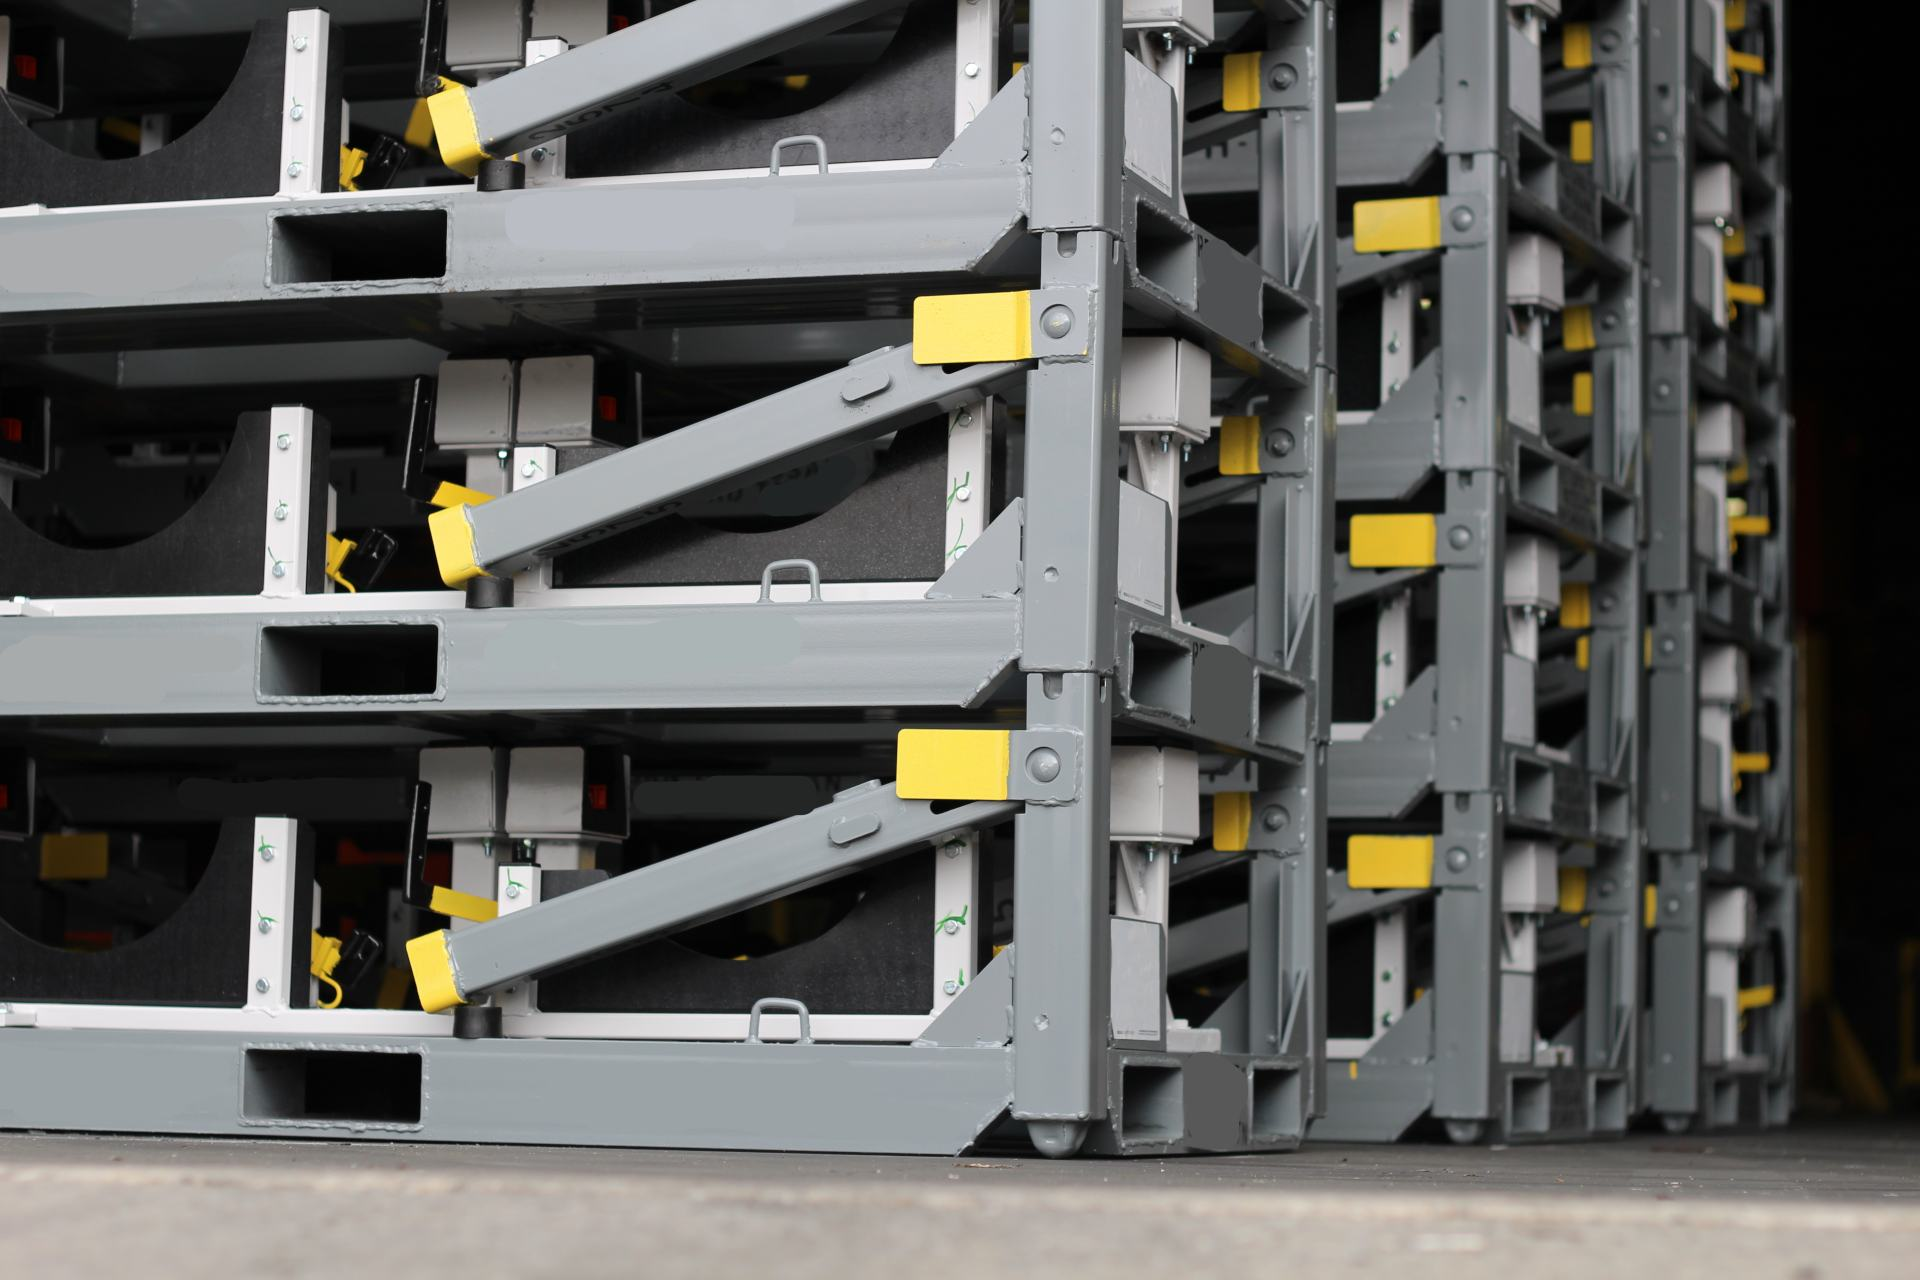 Collapsible engine racks